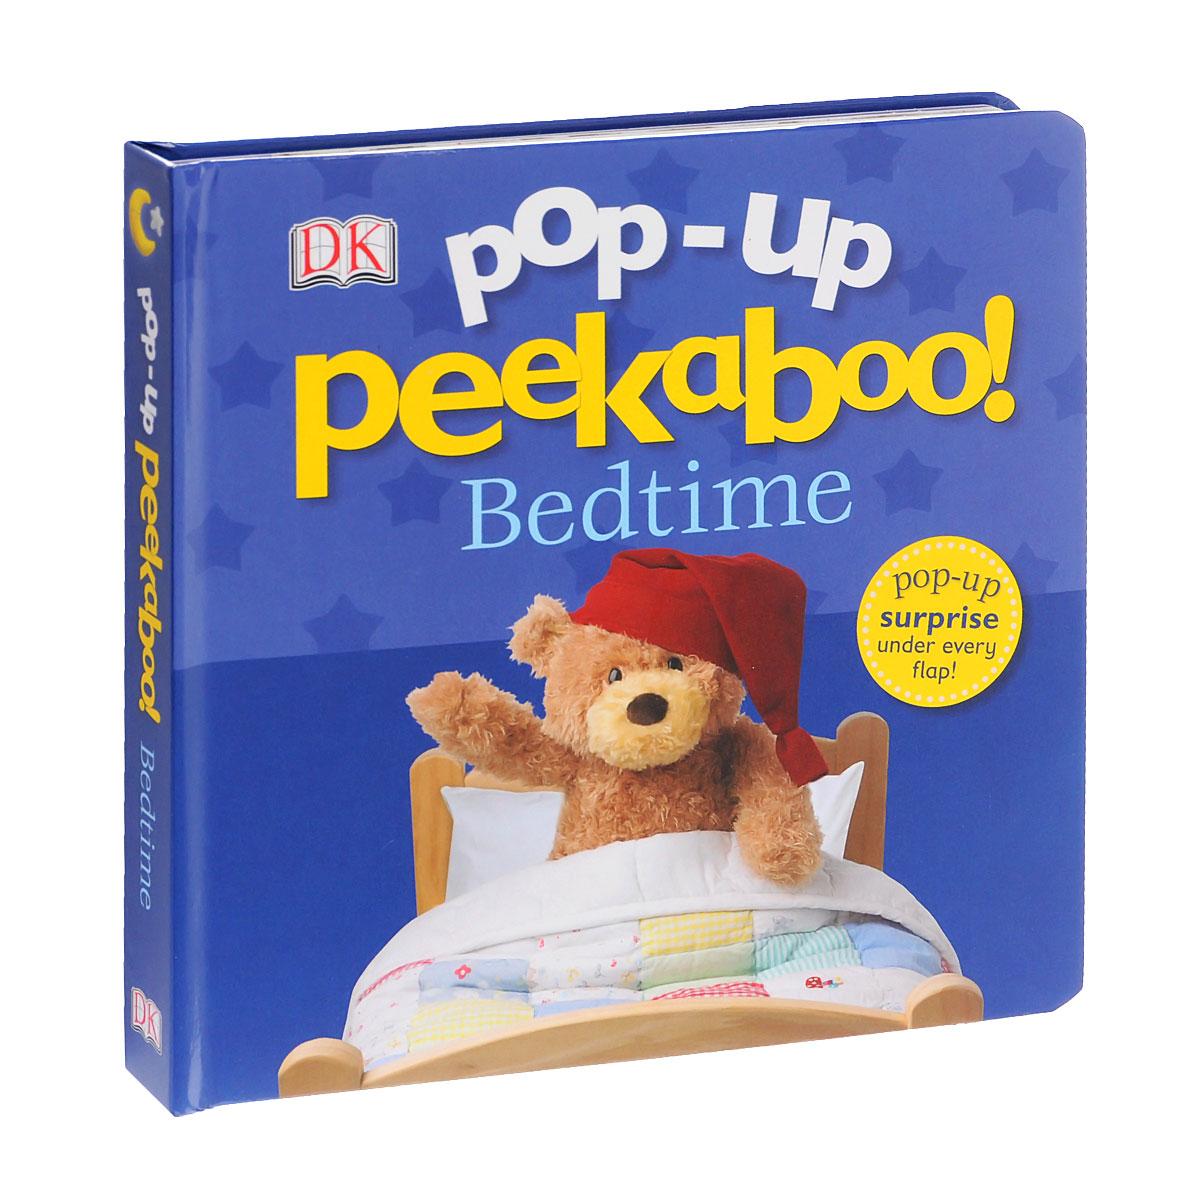 Pop-Up Peekaboo! Bedtime peekaboo bathtime